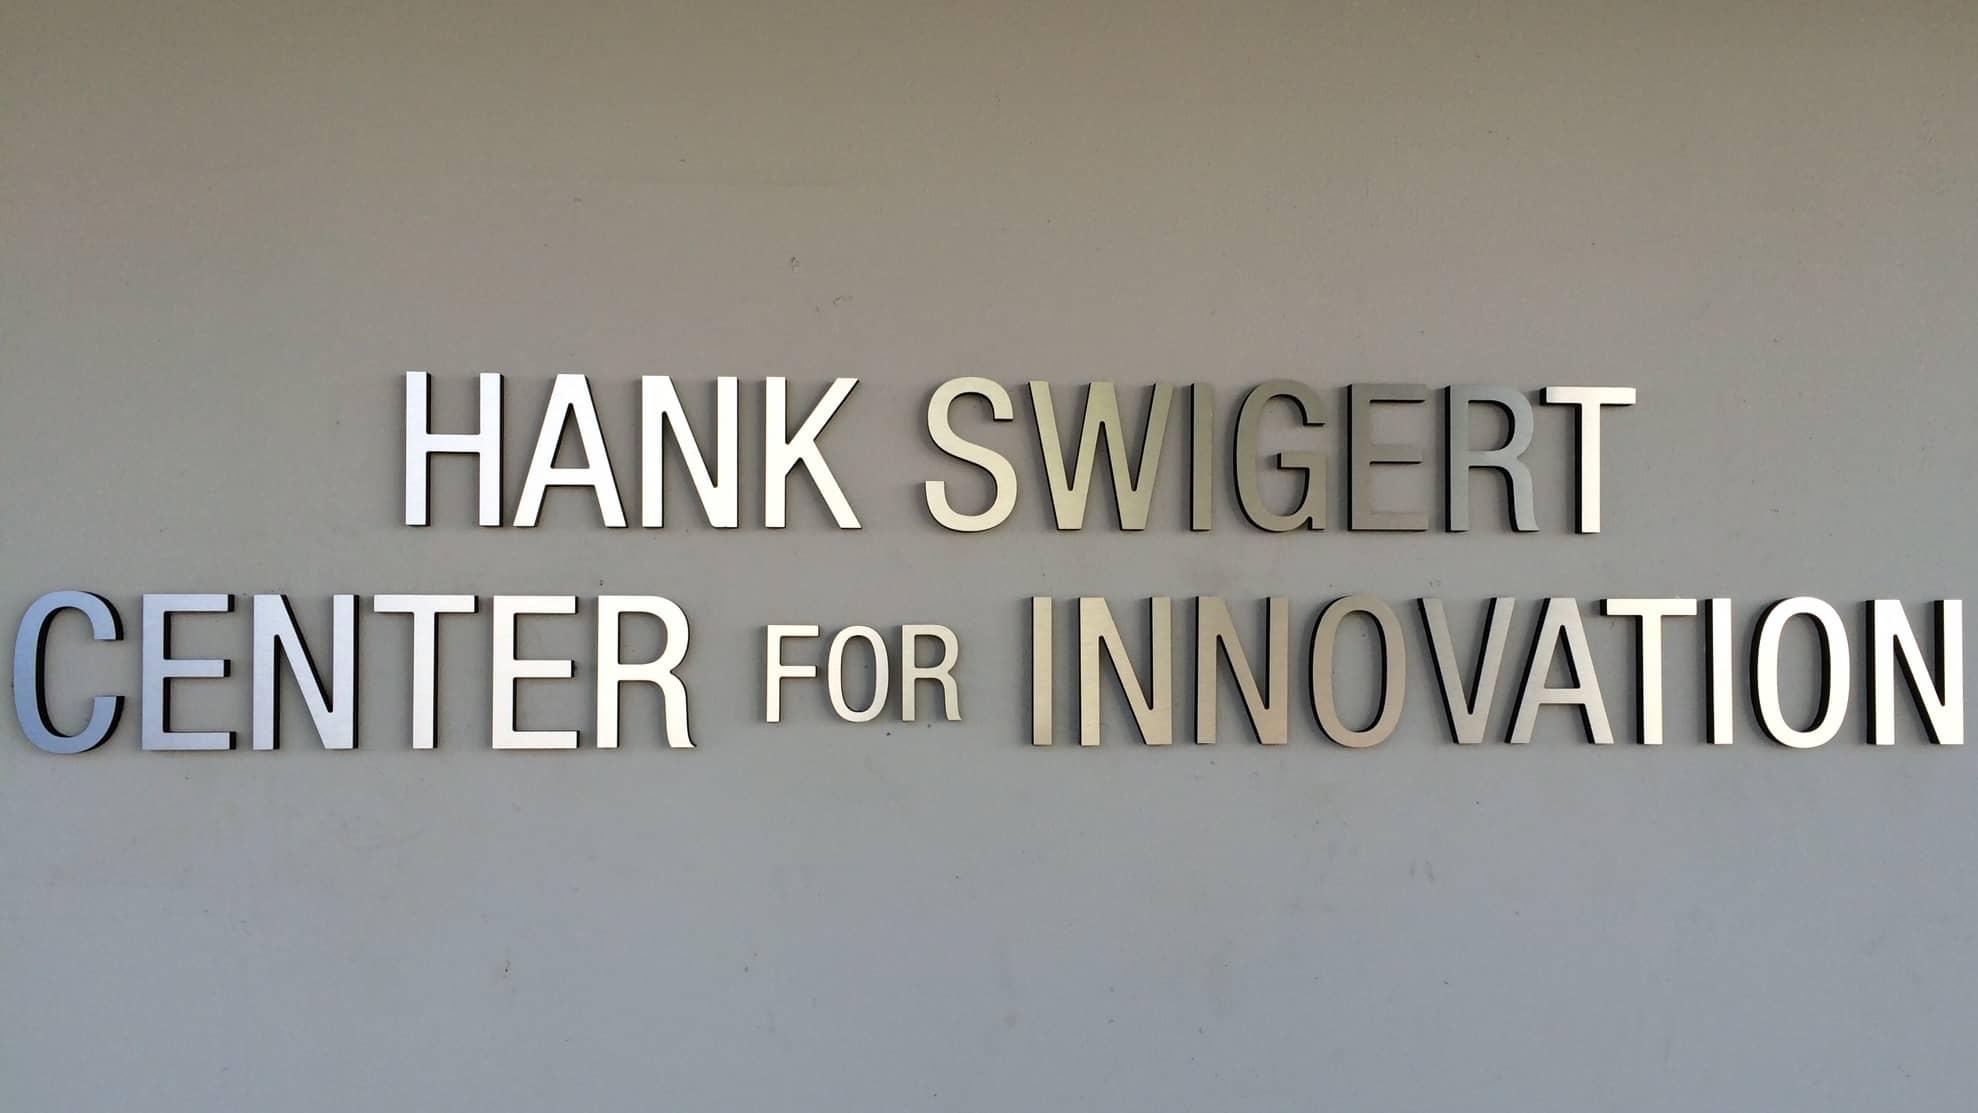 swigert dimensional building sign